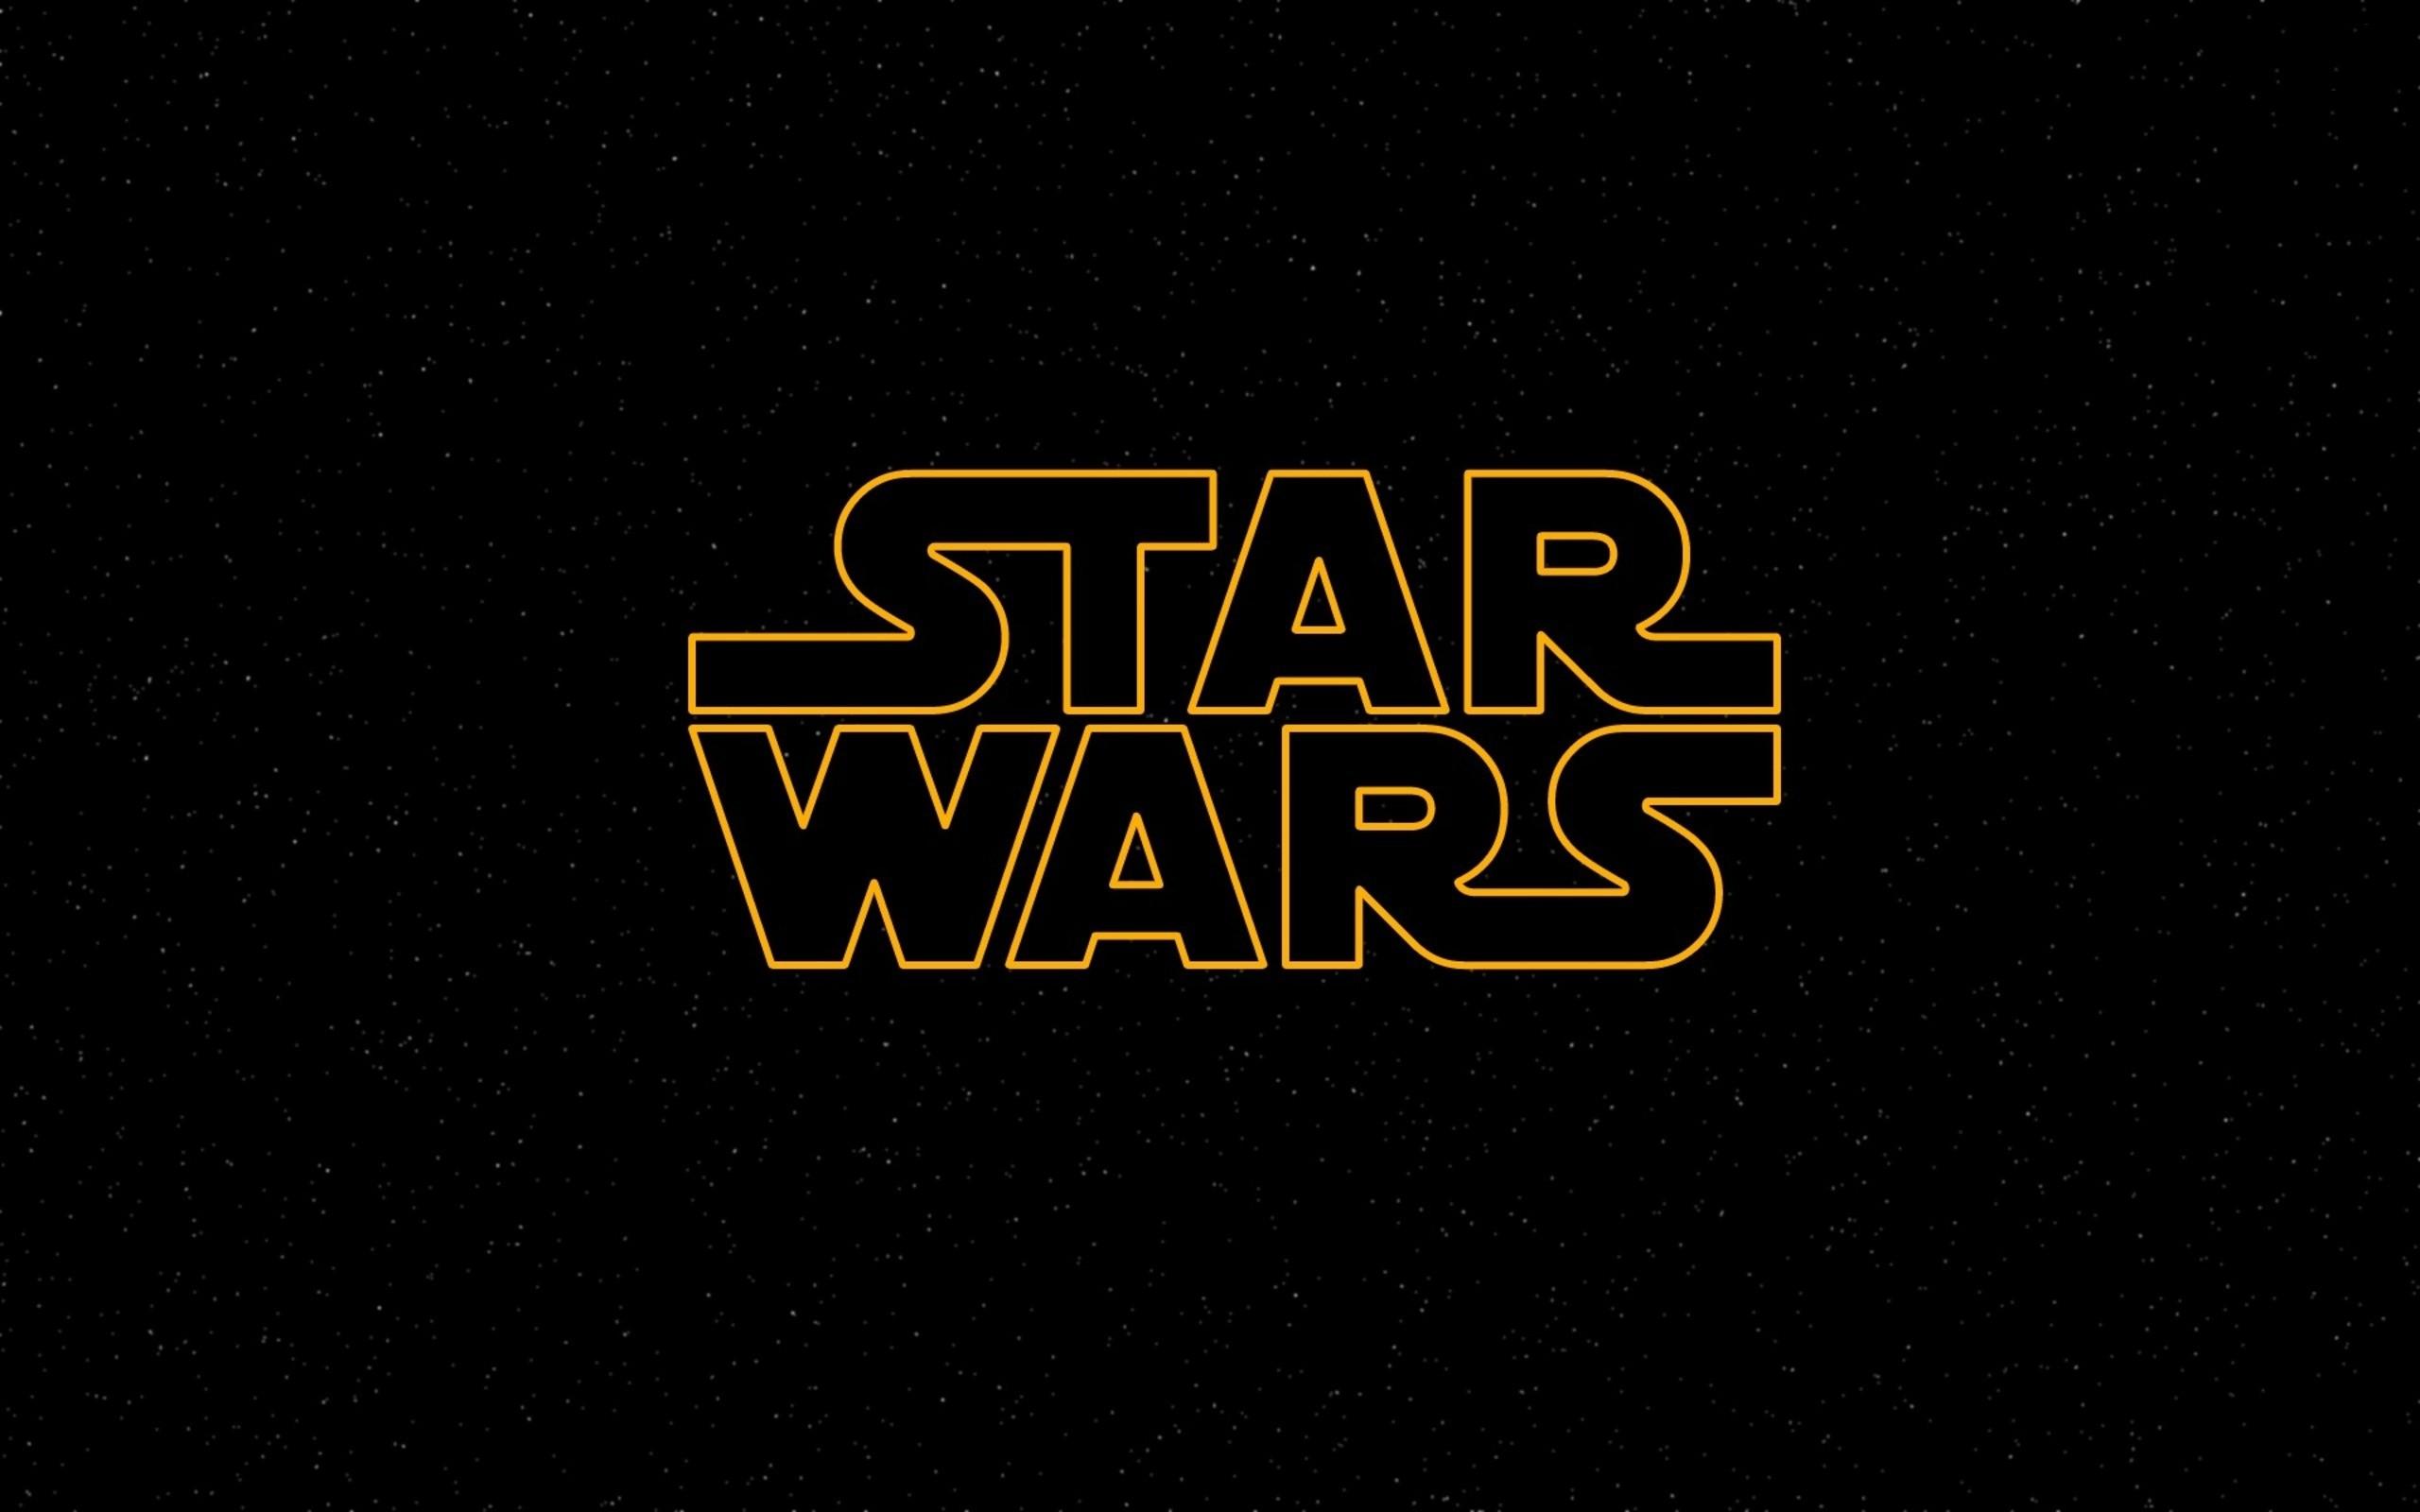 Star wars logos black background wallpaper 2560x1600 205430 star wars logos black background wallpaper 2560x1600 205430 wallpaperup voltagebd Image collections